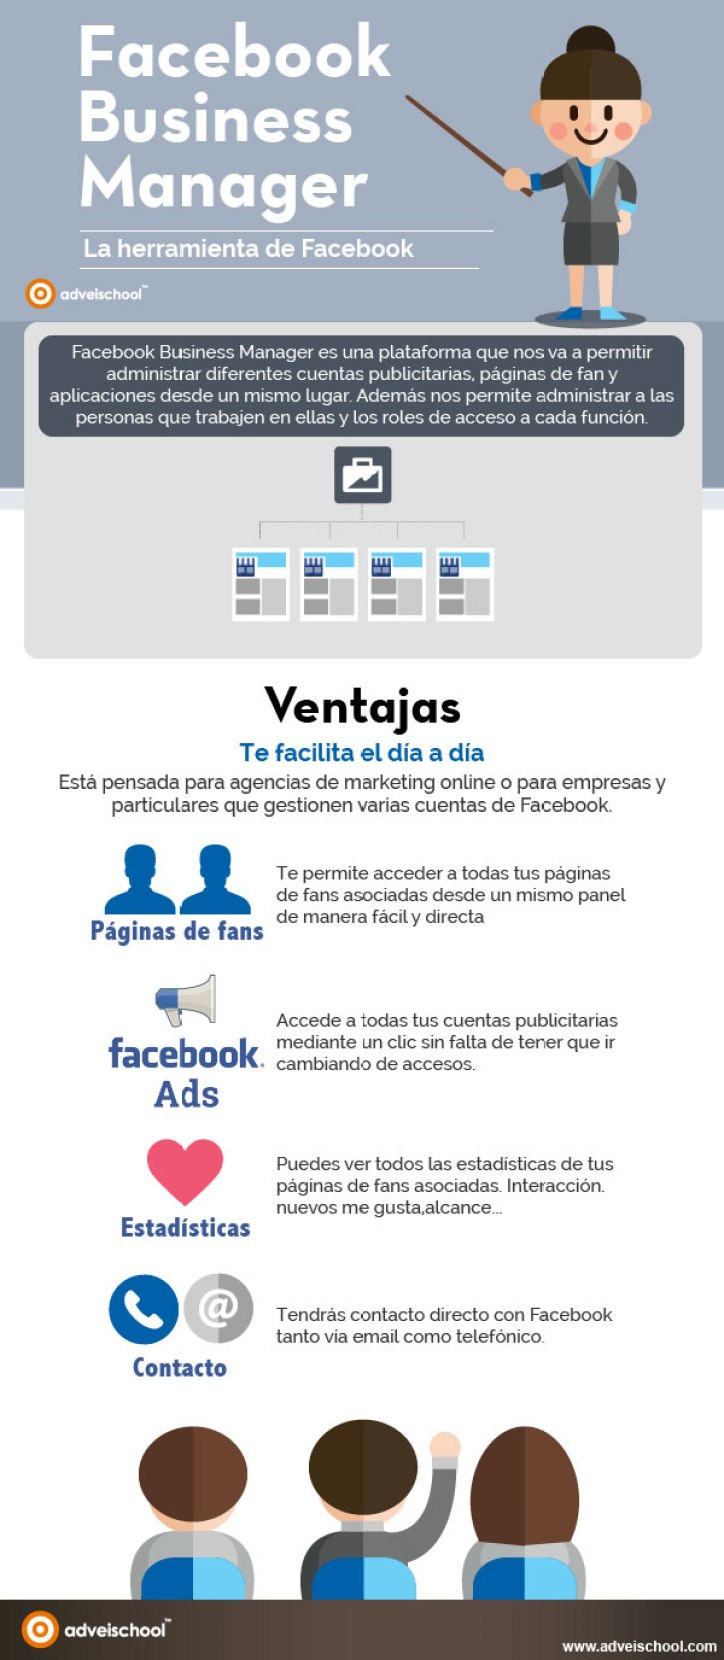 facebook-business-manager-infografia